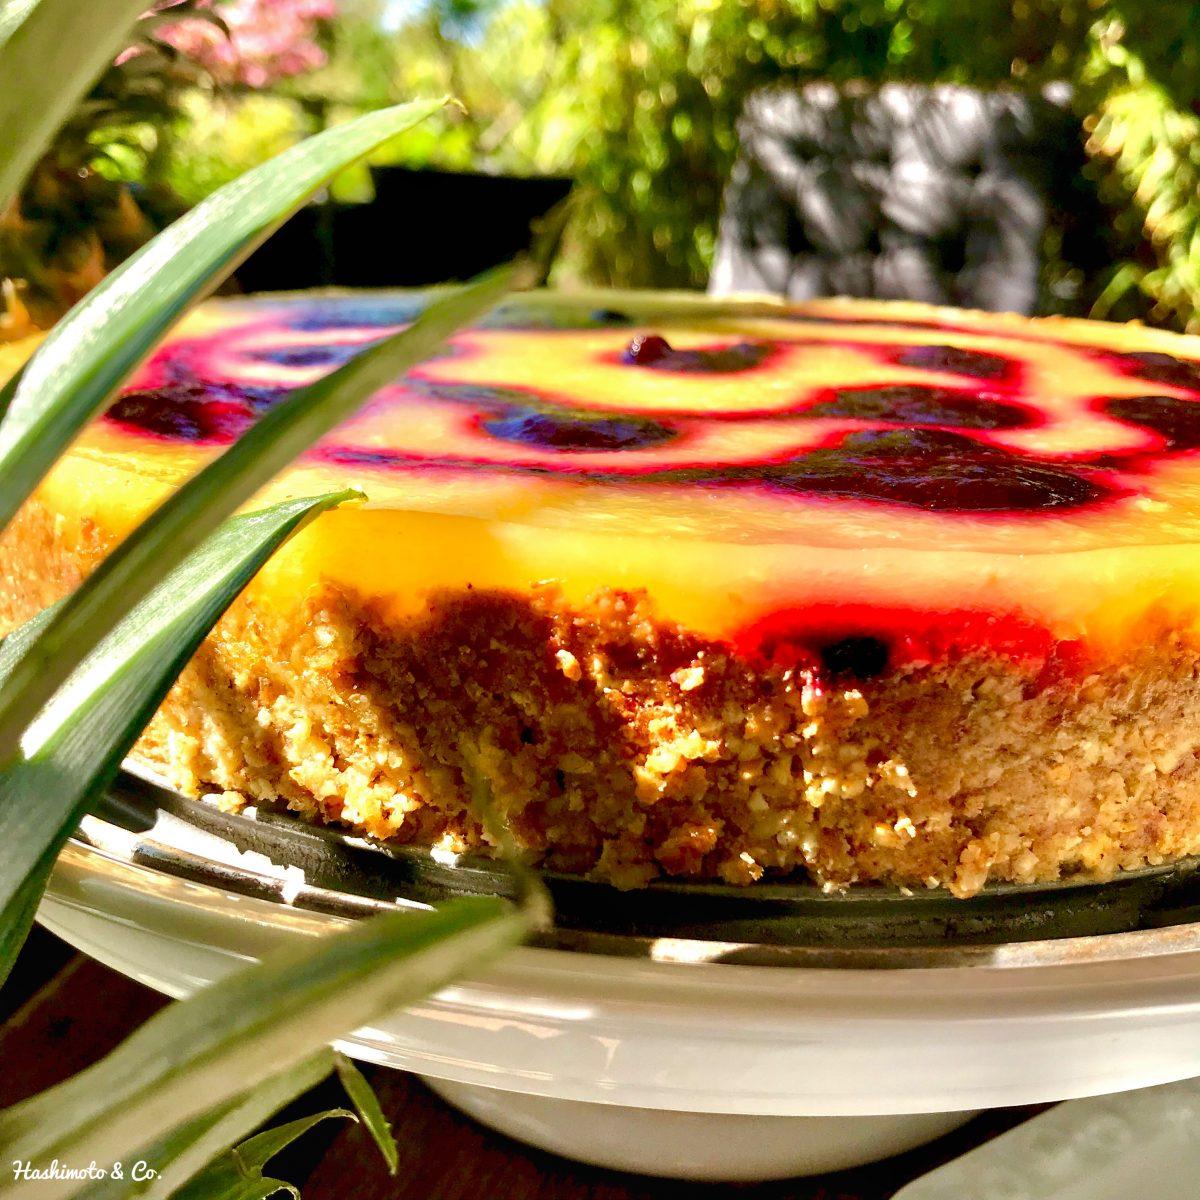 Sommerliche Ananas-Limetten-Tarte (AIP / Paleo / Kokosfrei)